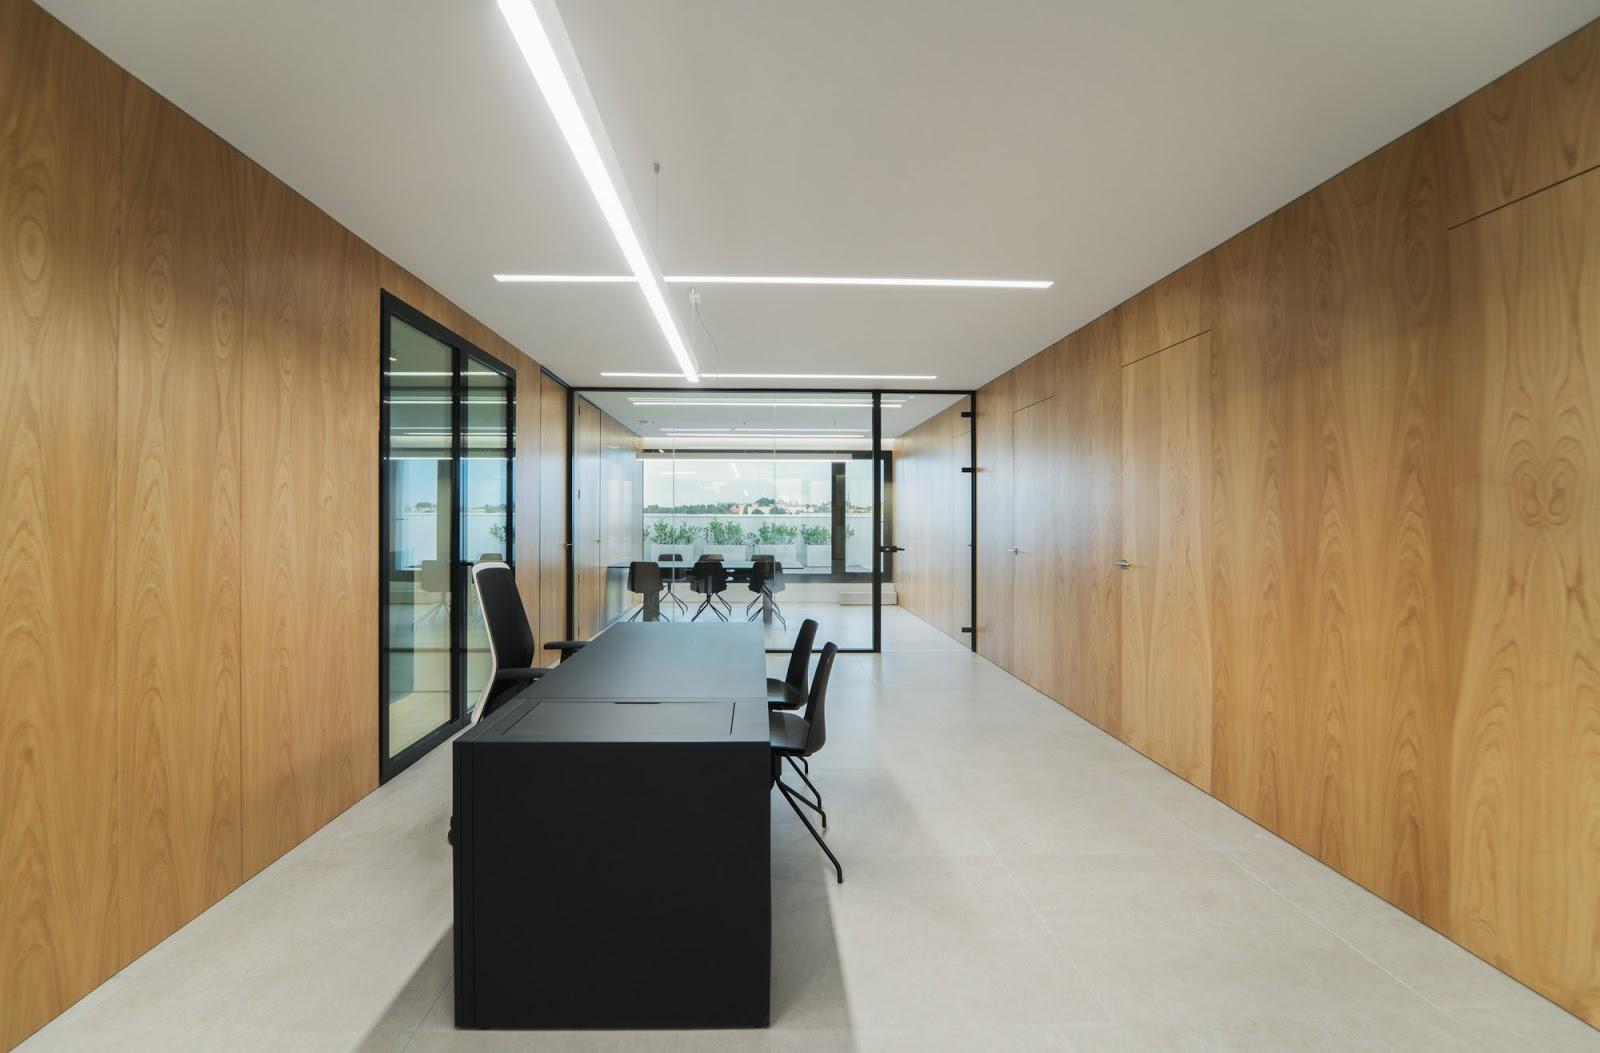 Ruben muedra estudio de arquitectura valencia - Estudio arquitectura bilbao ...